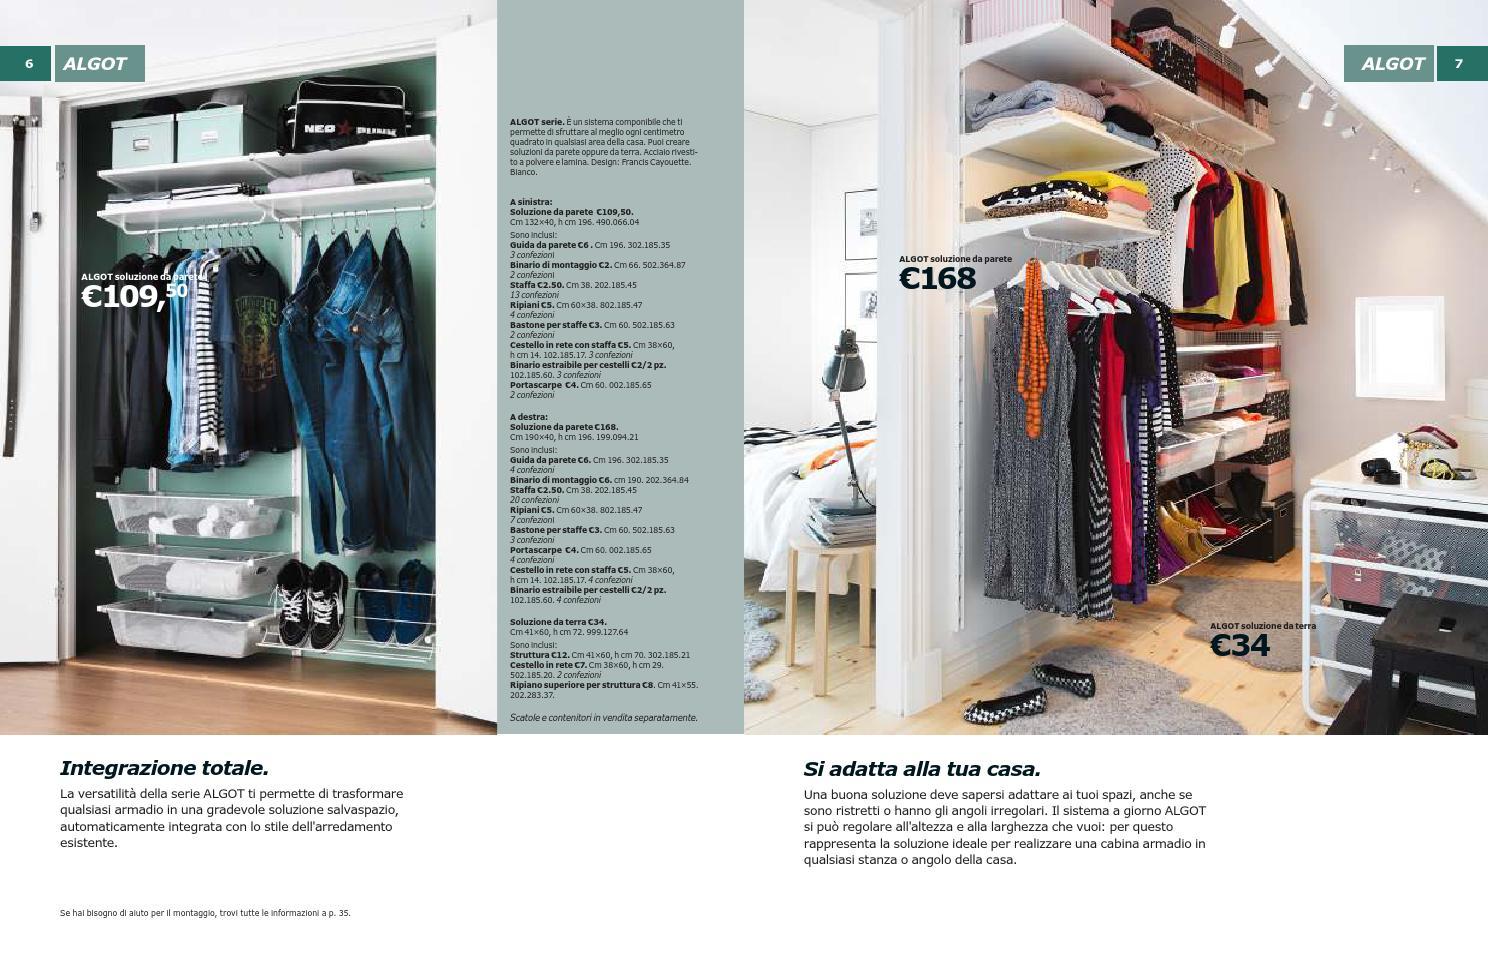 Cabina Armadio Ikea Algot.Ikea 31gen By Fabrizio Volante Issuu